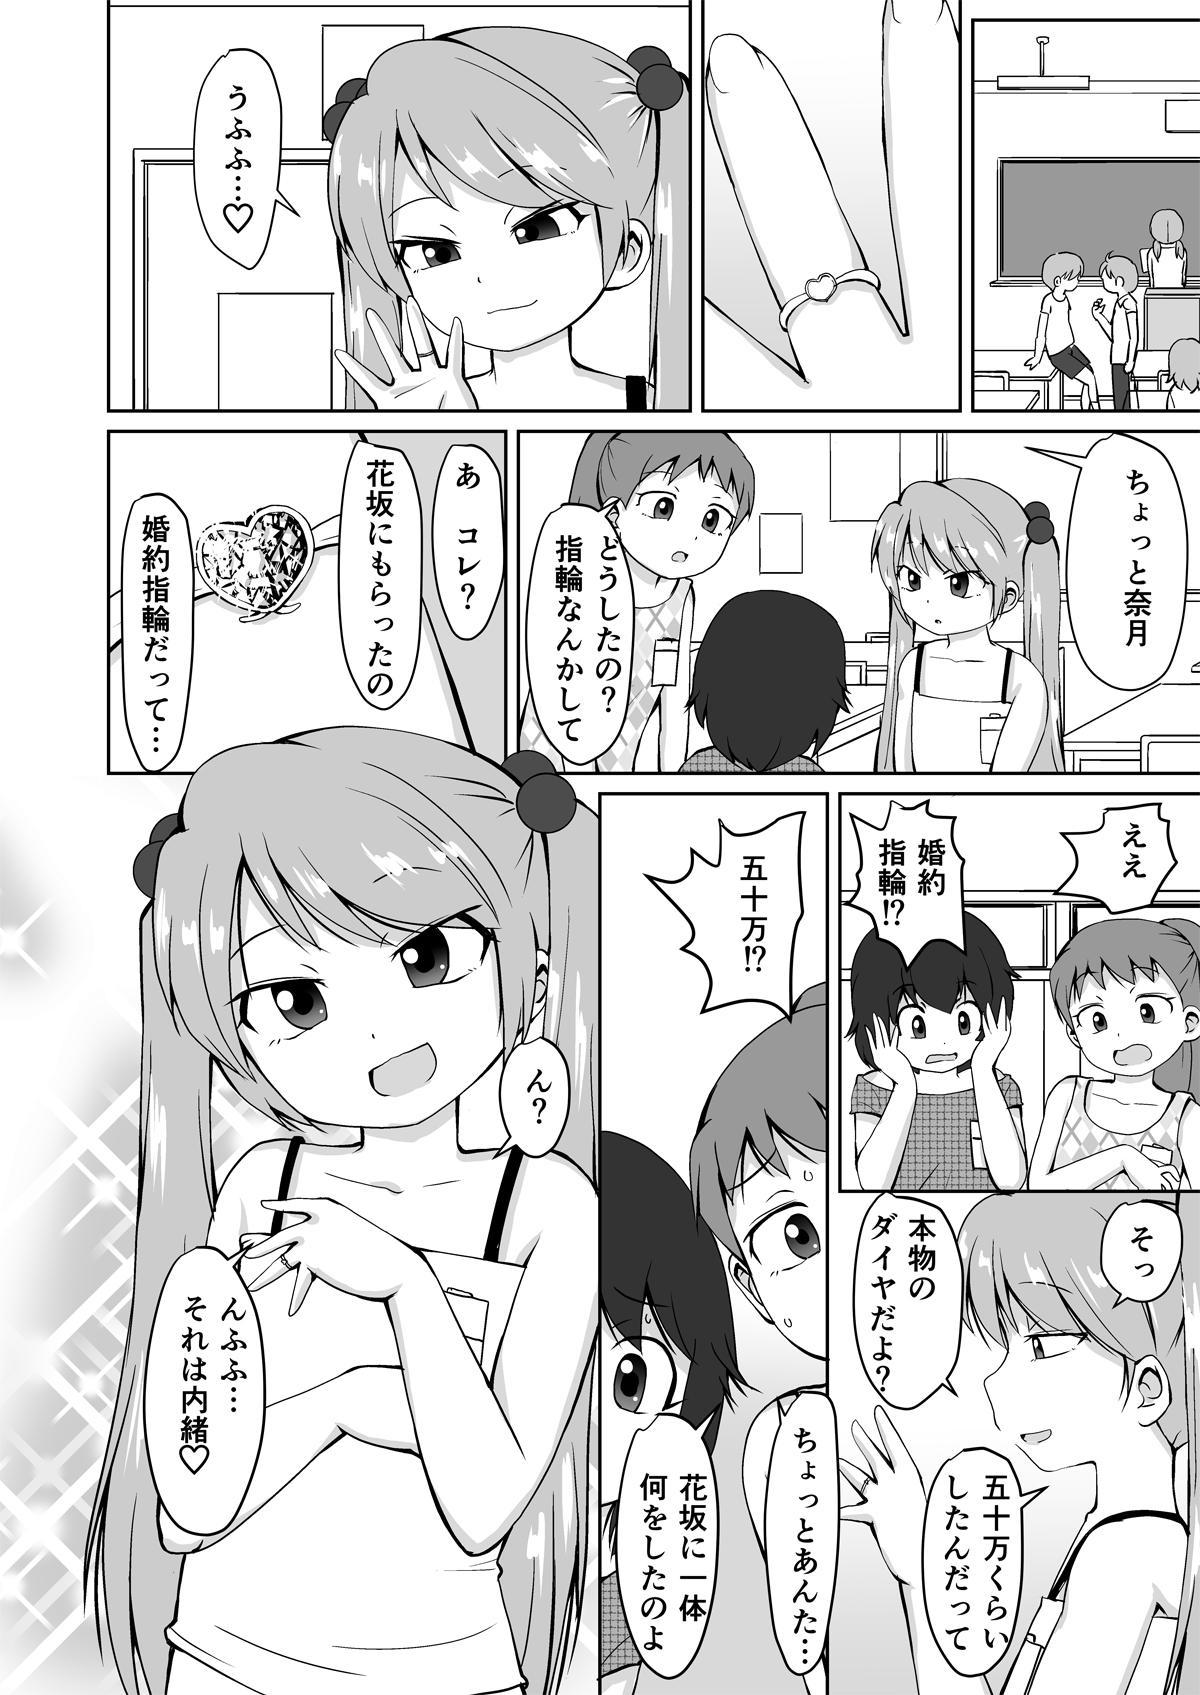 Houkago Buotoko Sensei 29